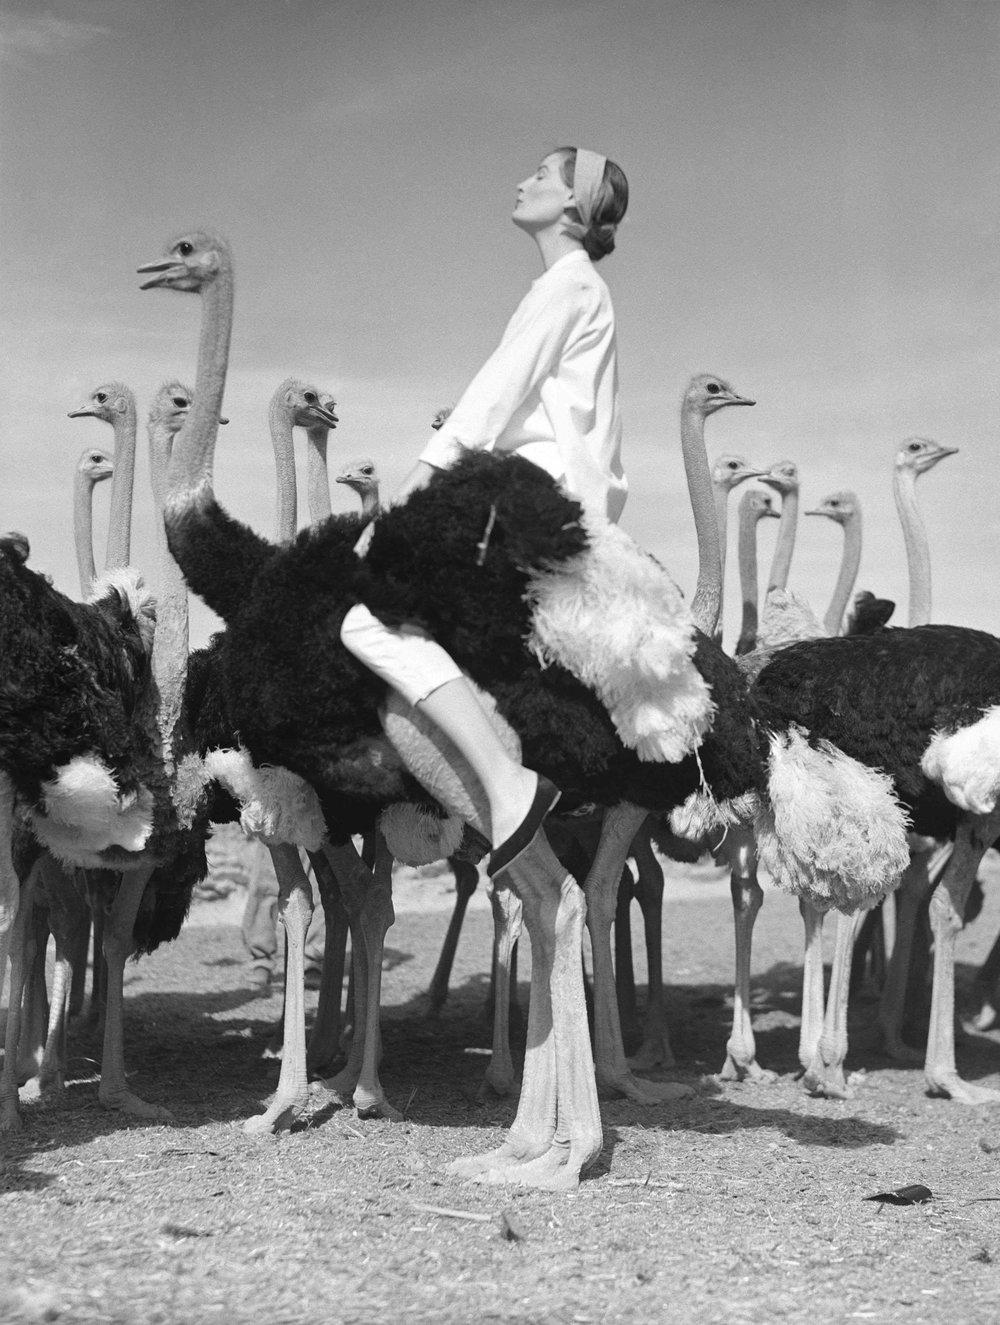 Wenda & Ostriches in South Africa for Vogue Magazine, 1951